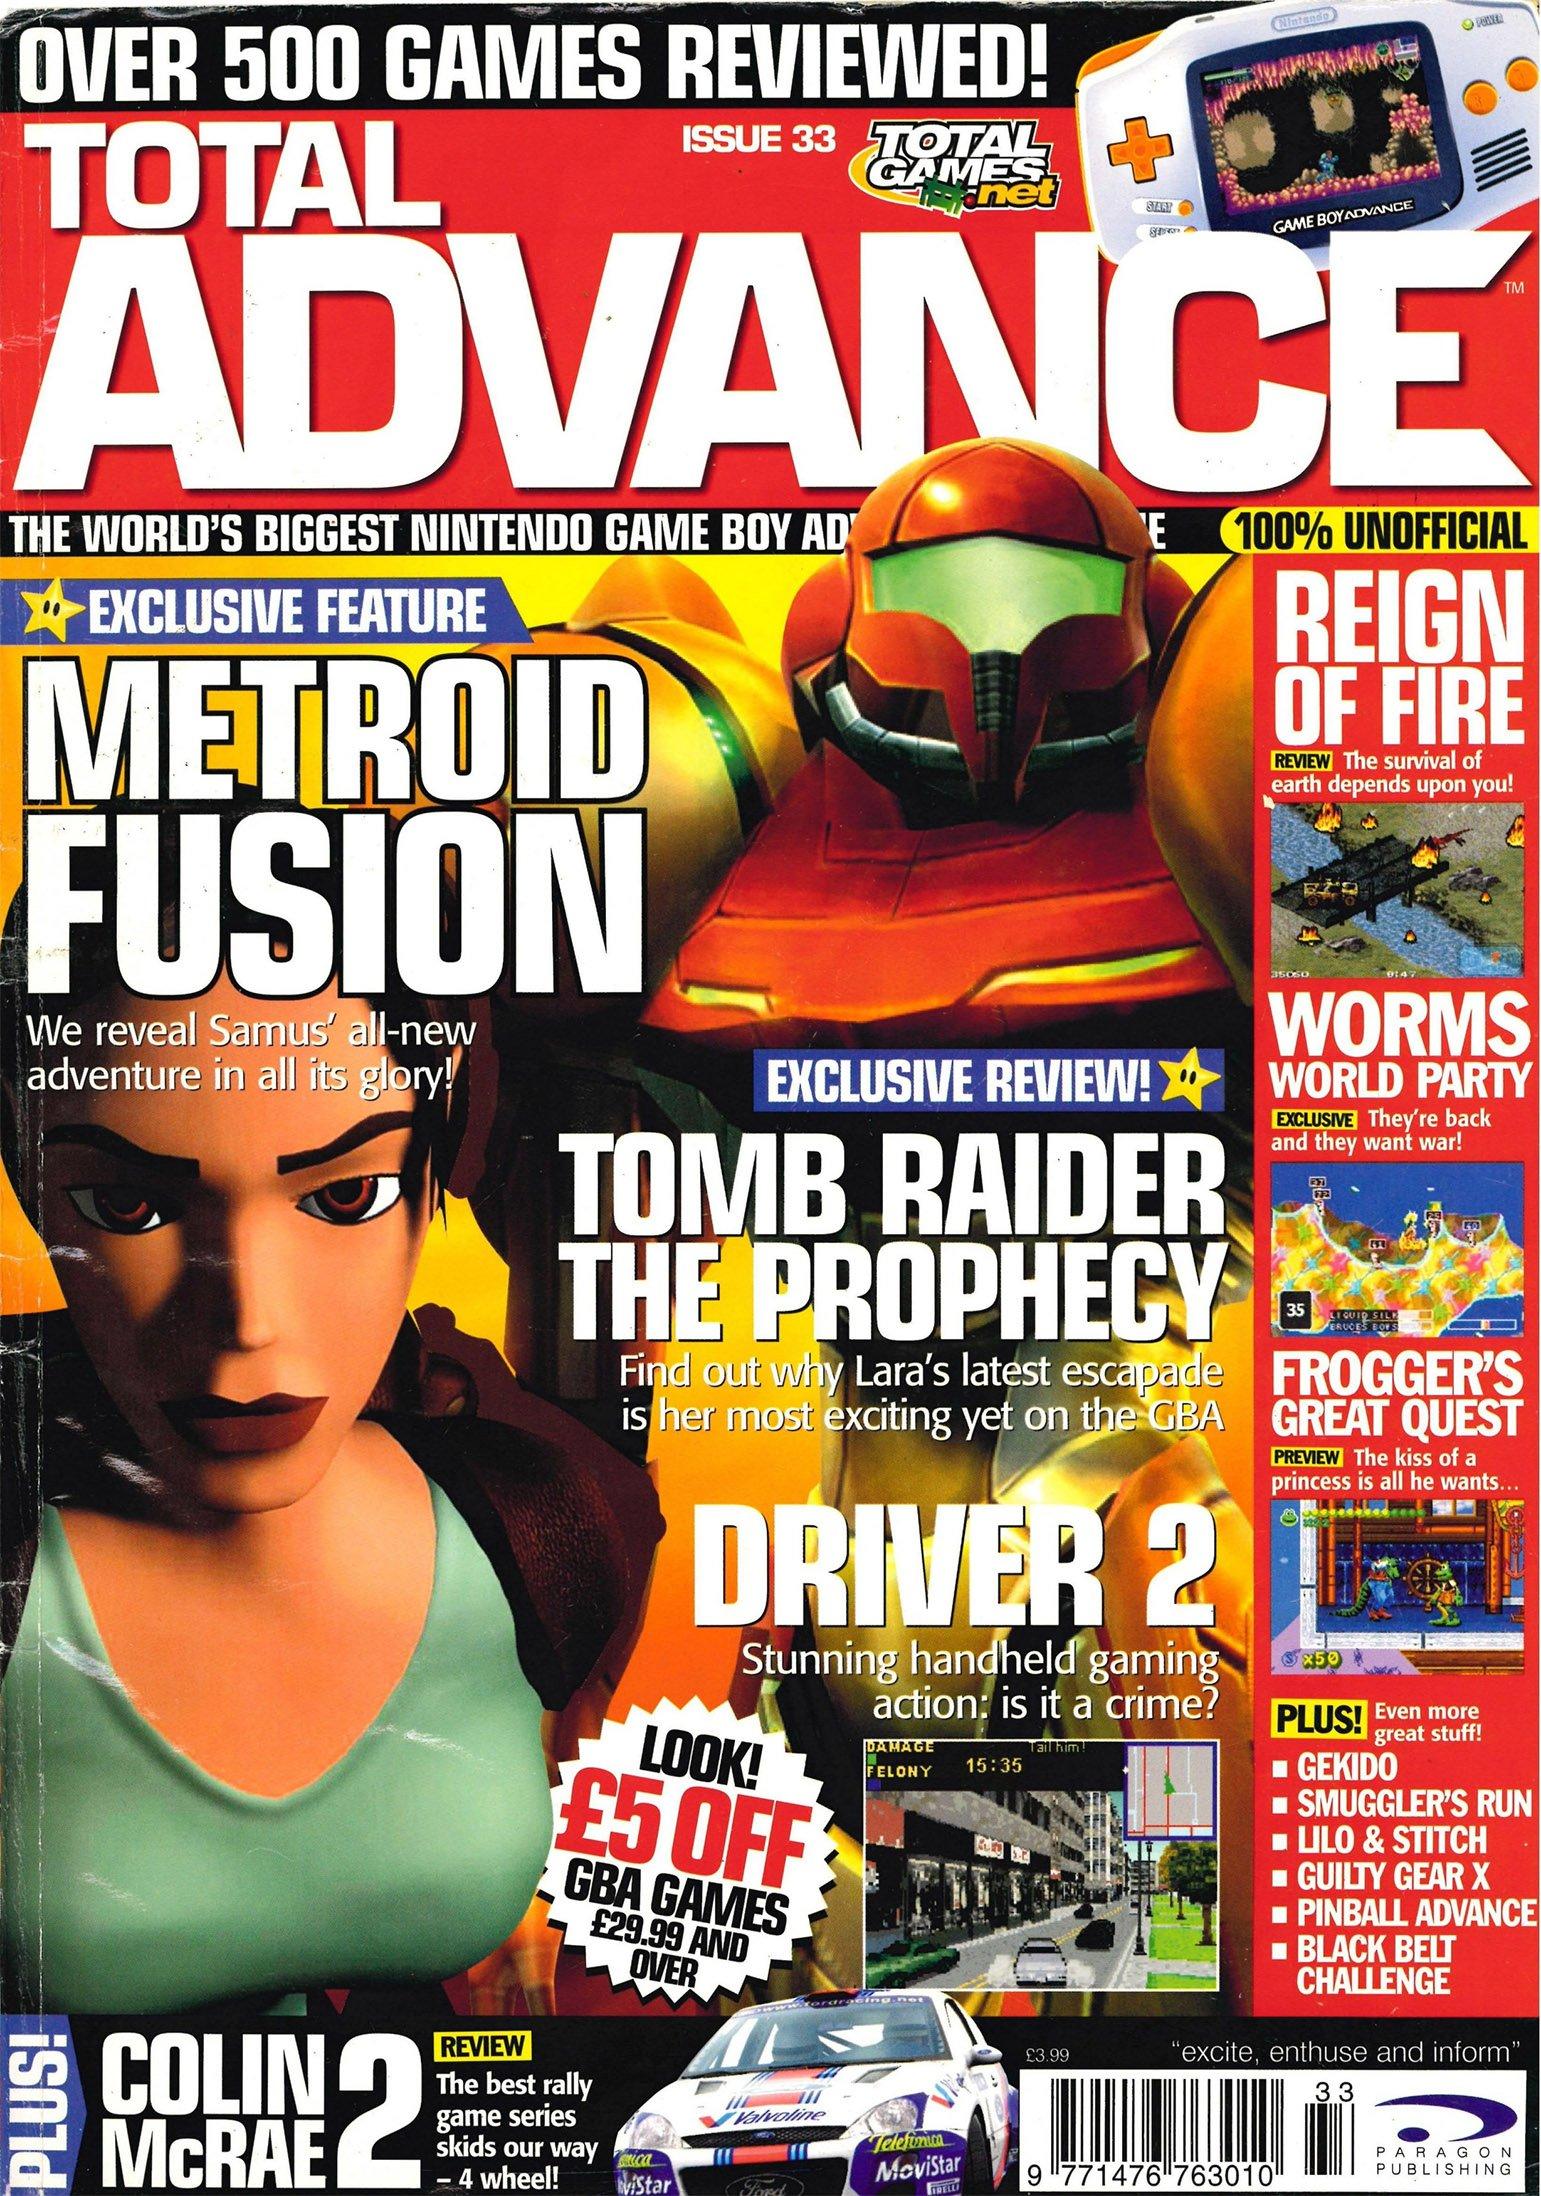 Total Advance Issue 33 (September 2002)